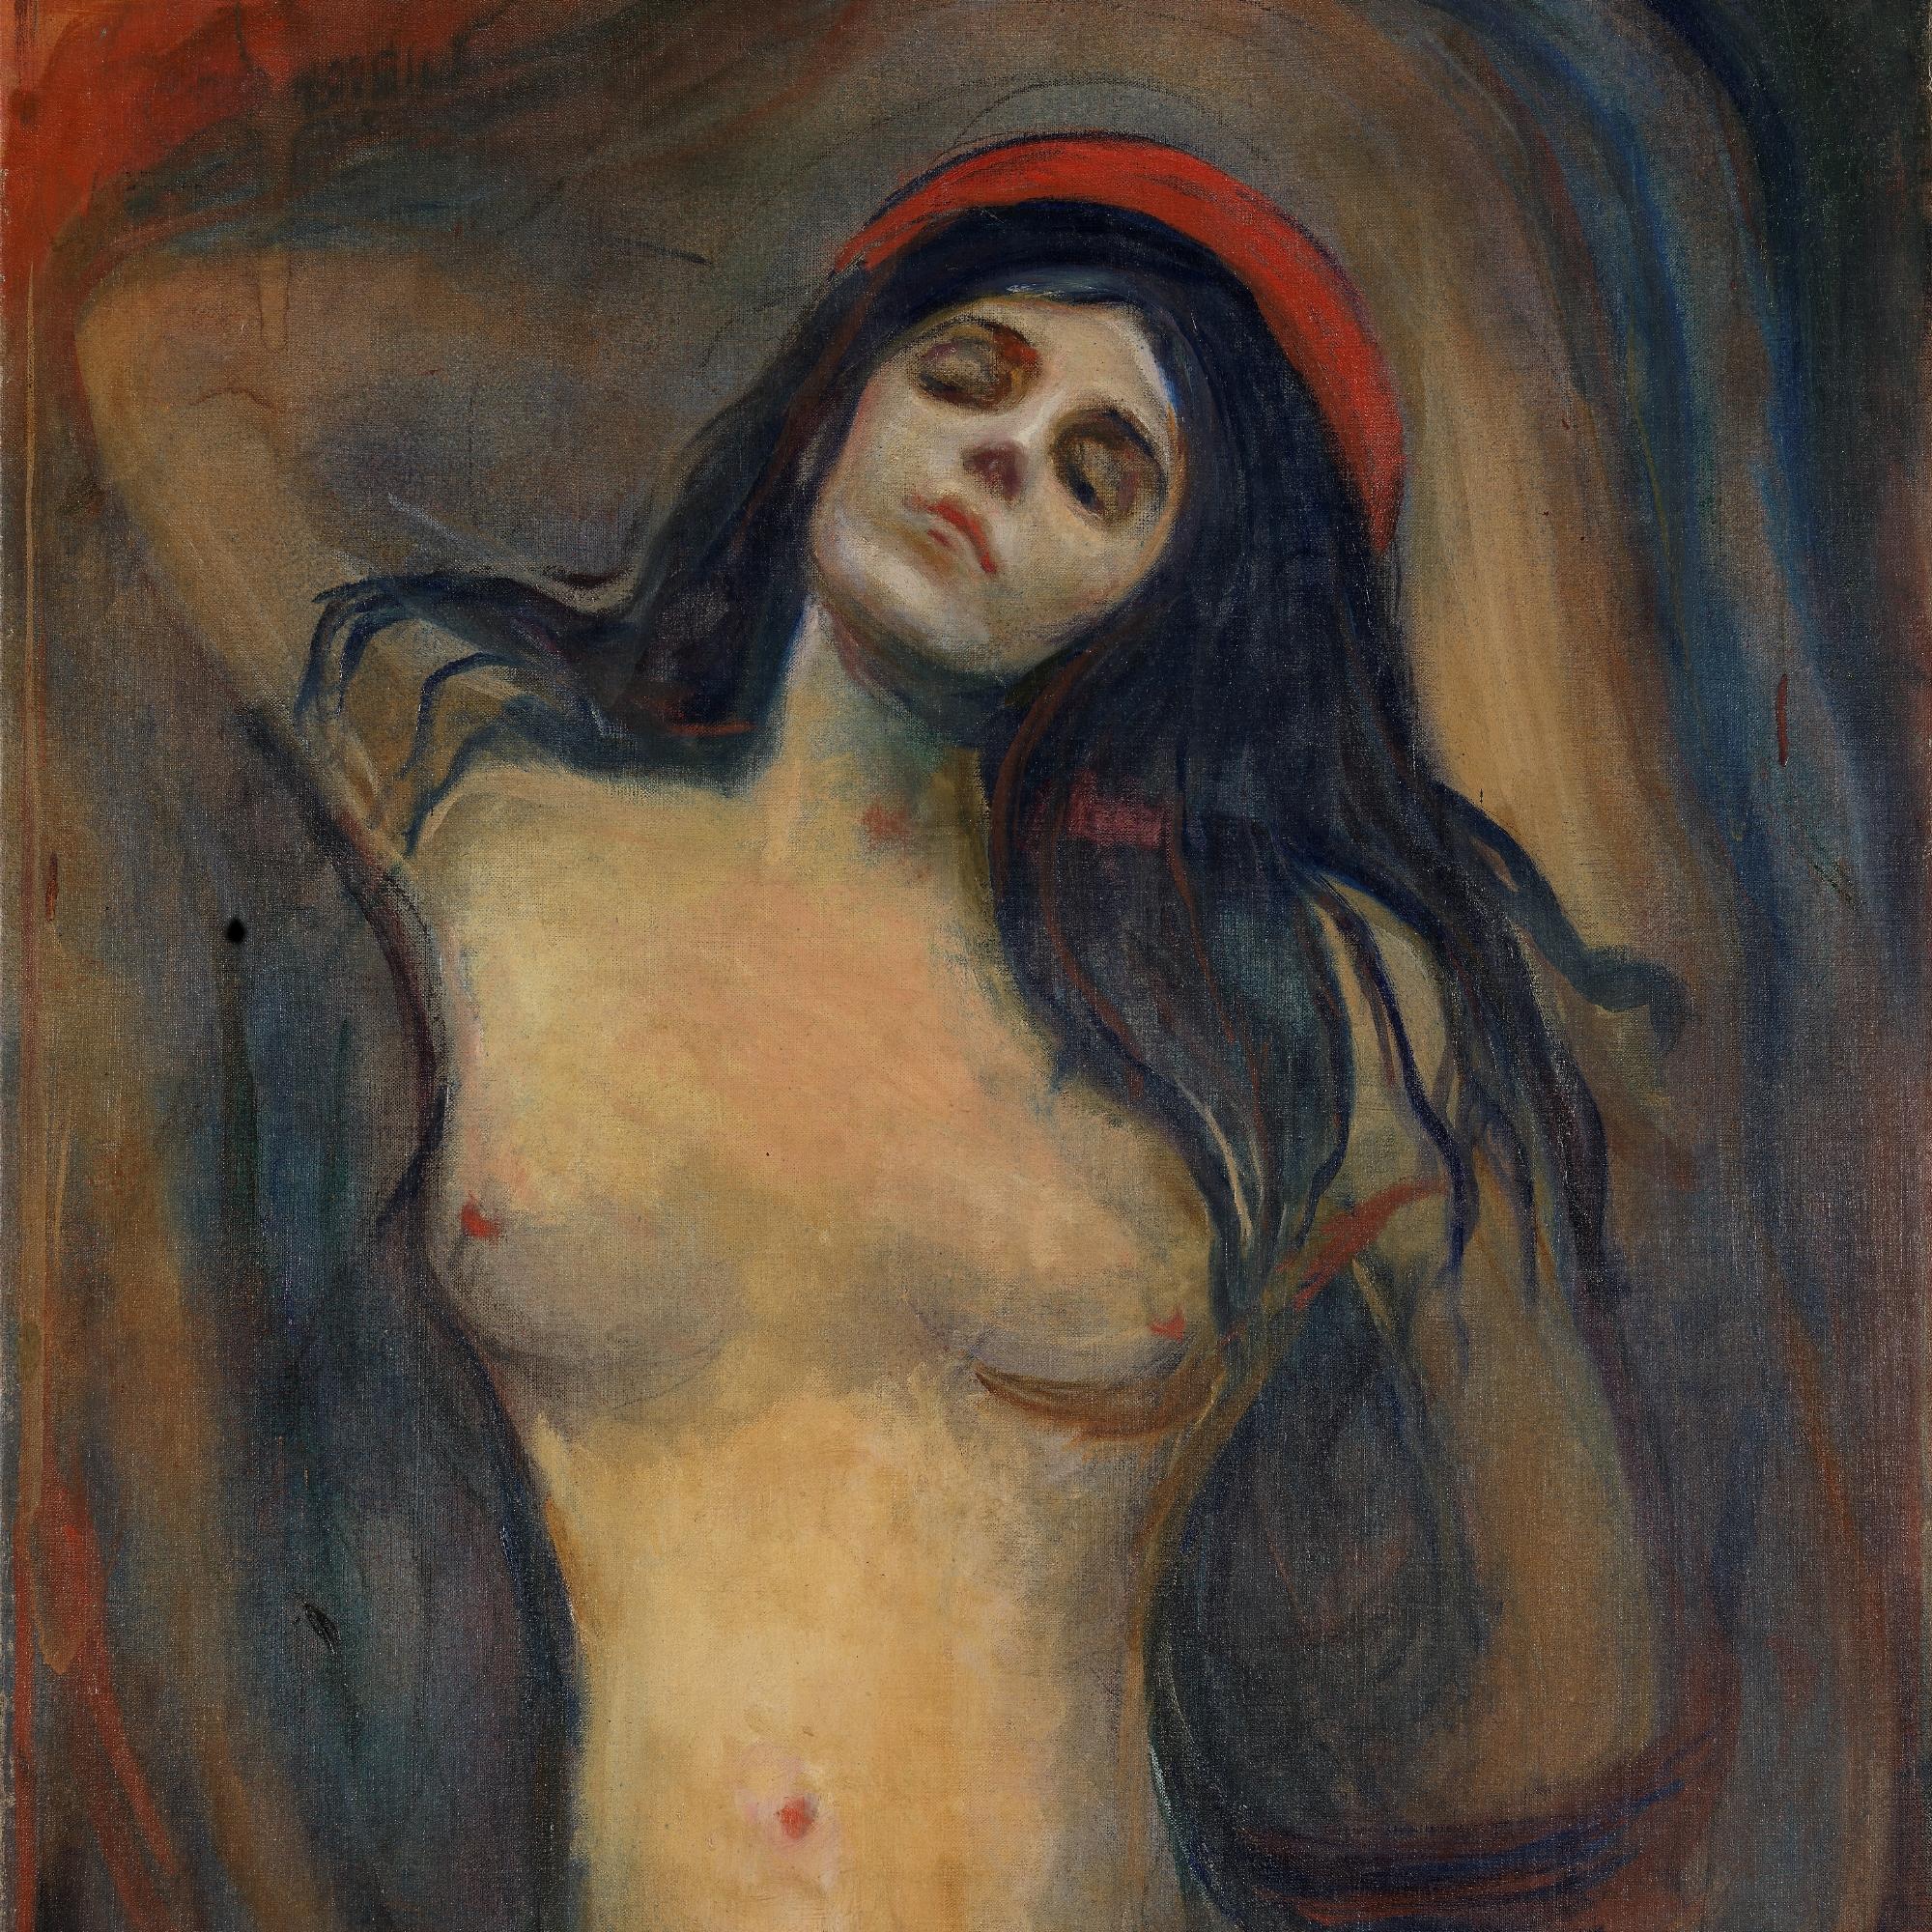 Can norway mountain women nude